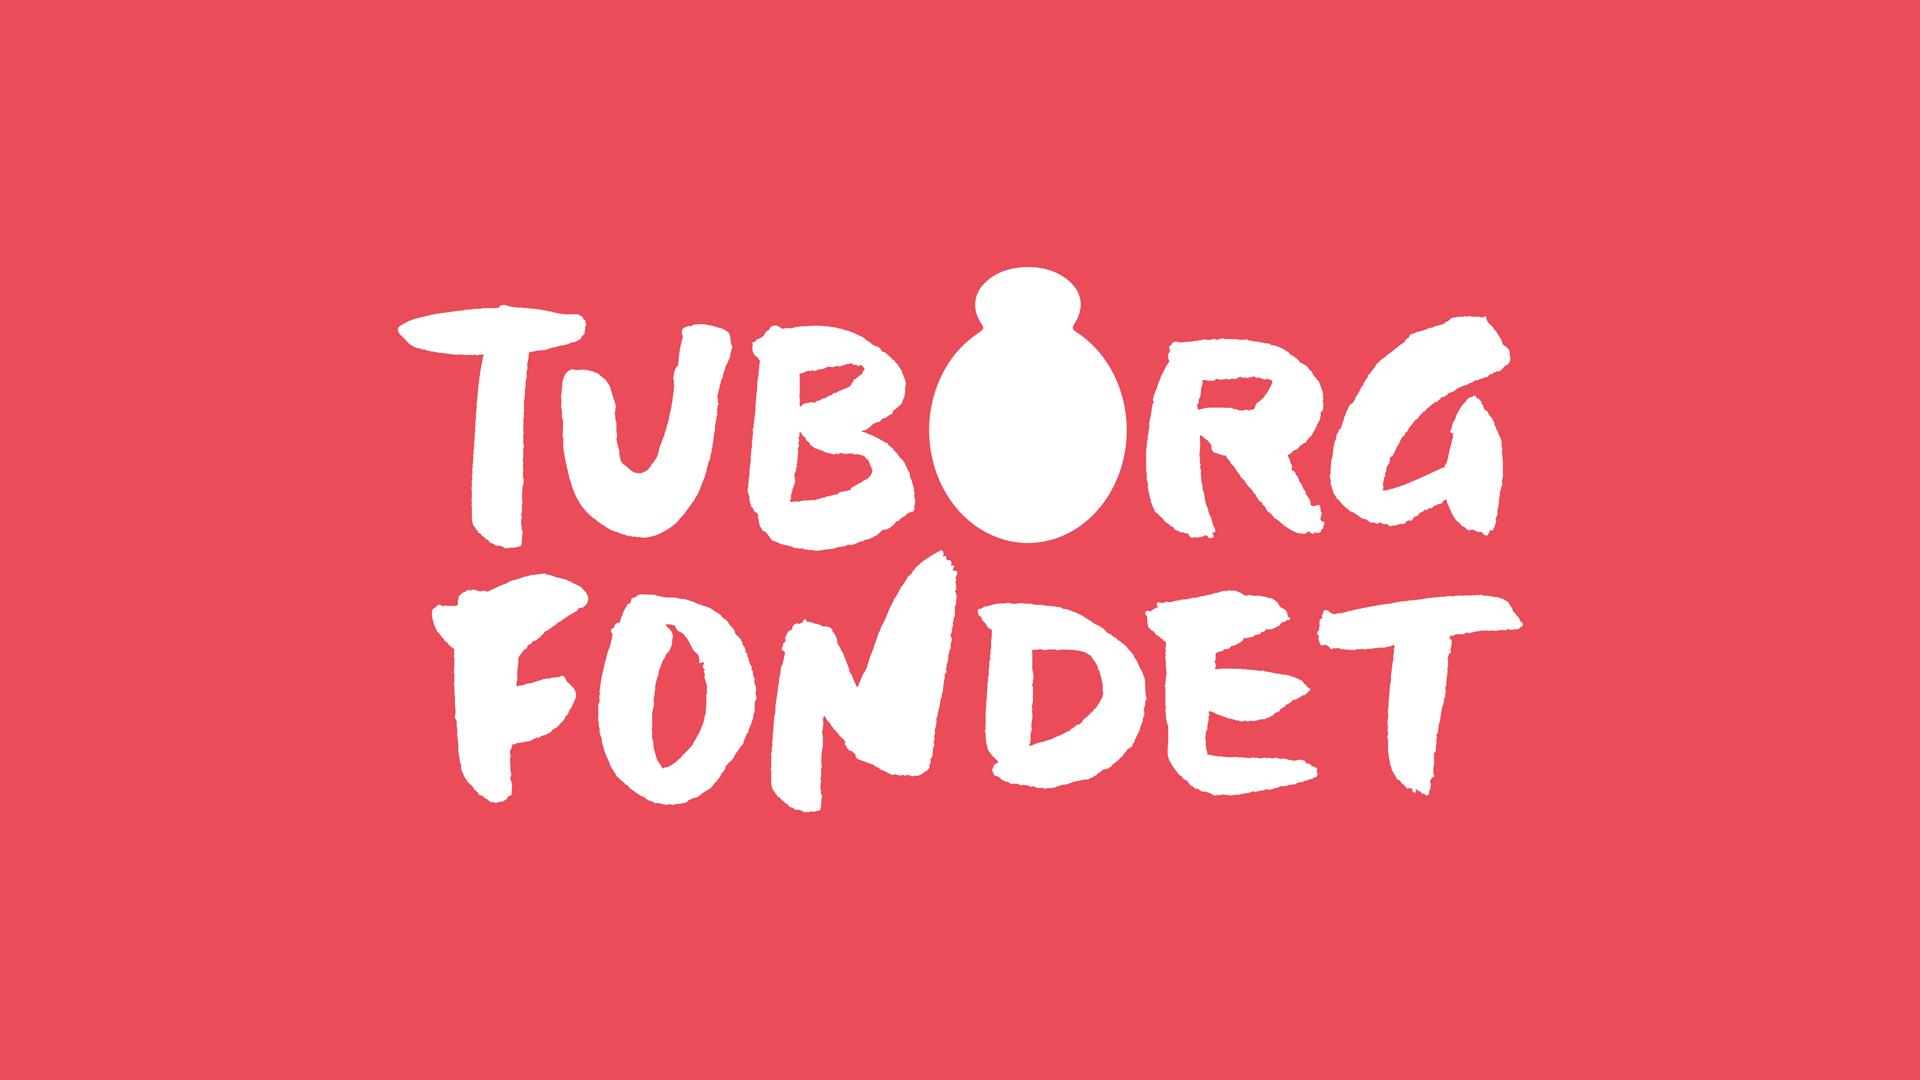 Emil Wibe - Tuborgfondet